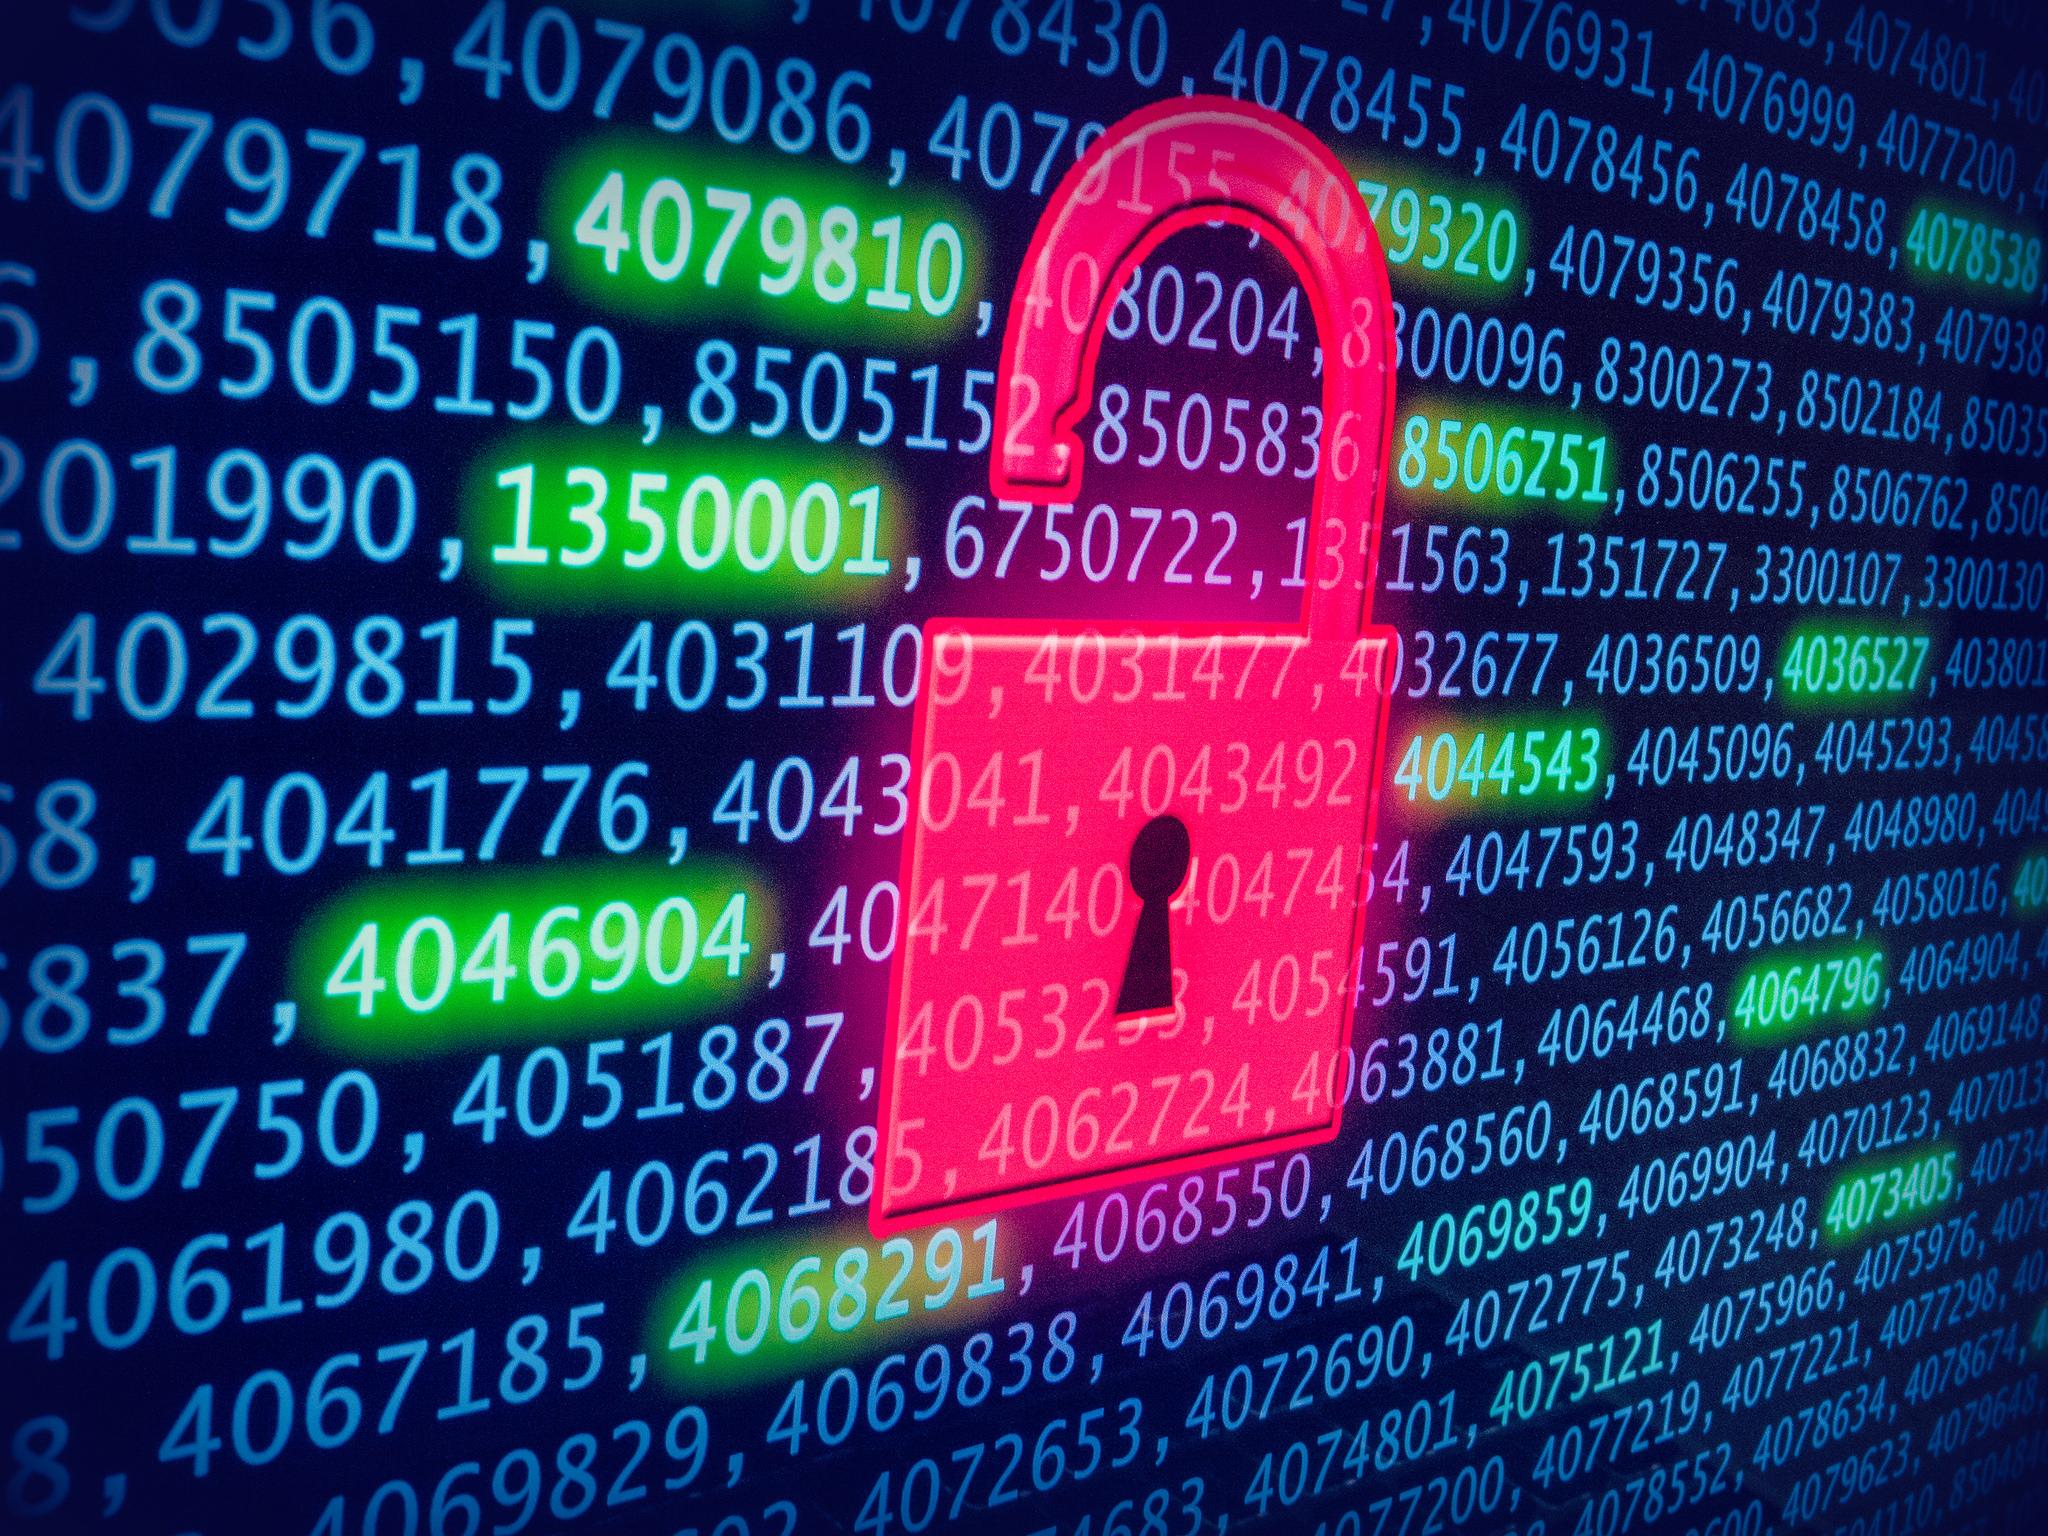 cyber-security-data-breach-hack